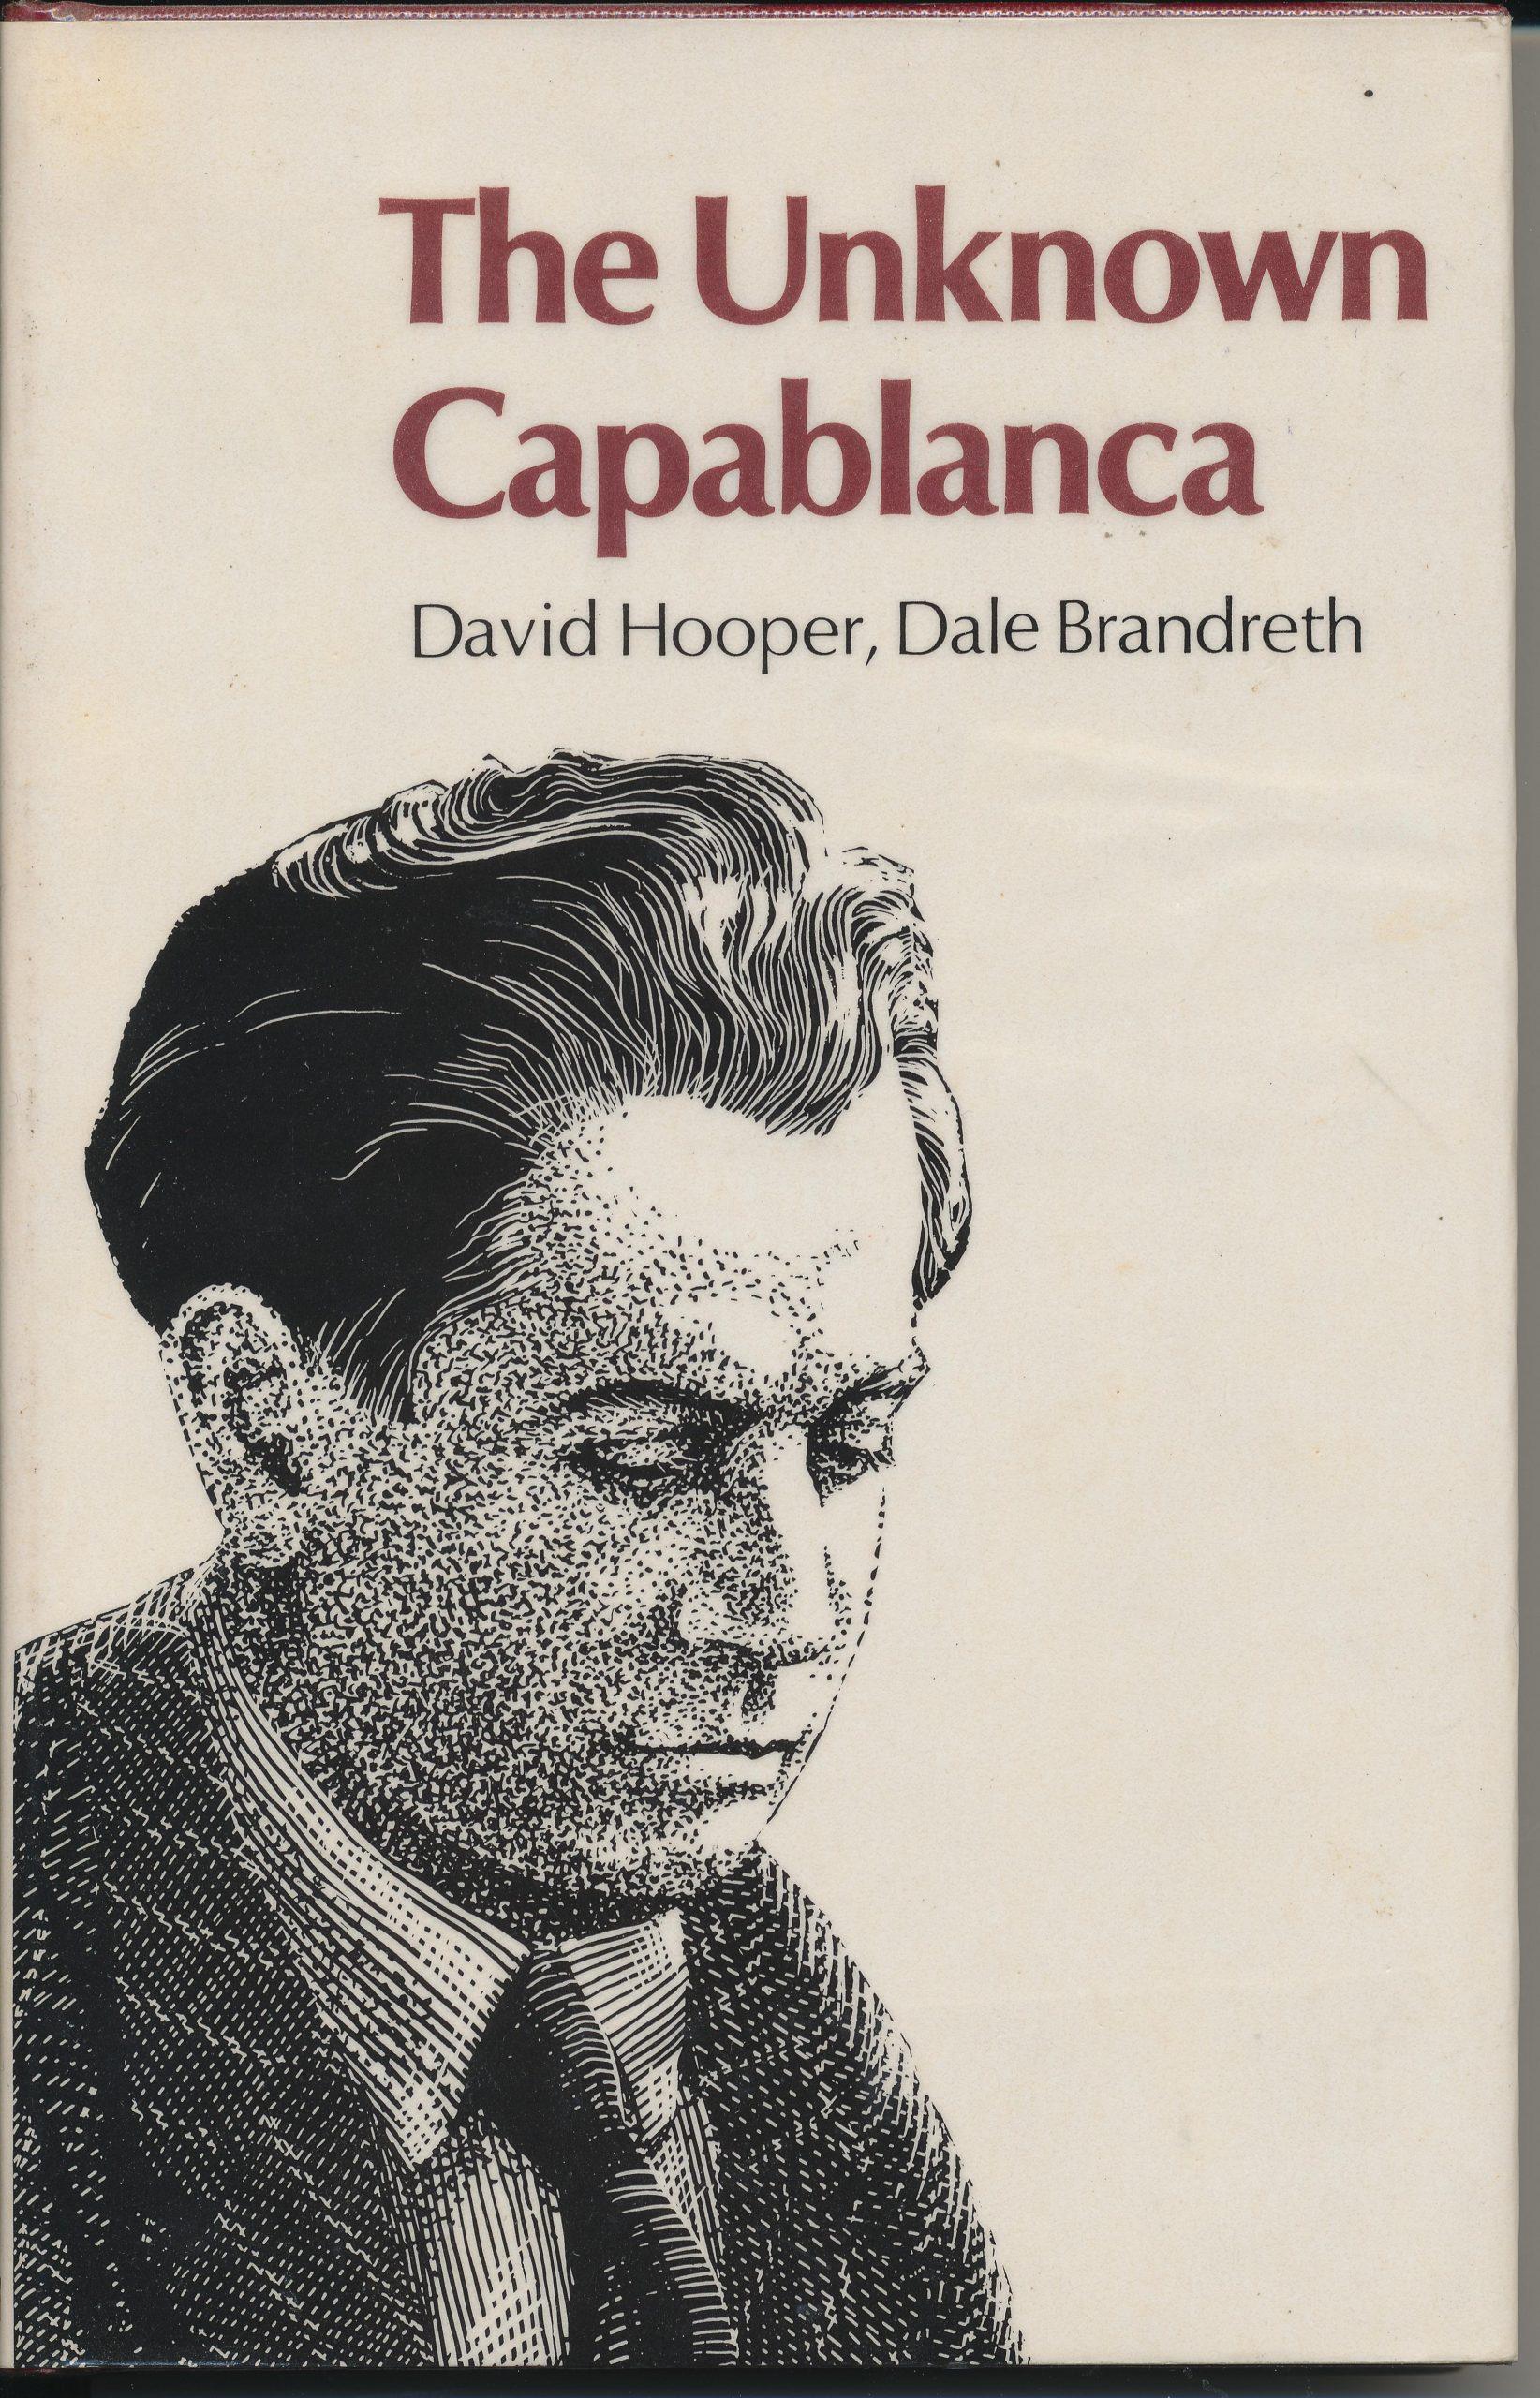 The Unknown Capablanca, David Hooper & Dale Brandreth, Batsford, London, 1975, ISBN, 0 7134 2964